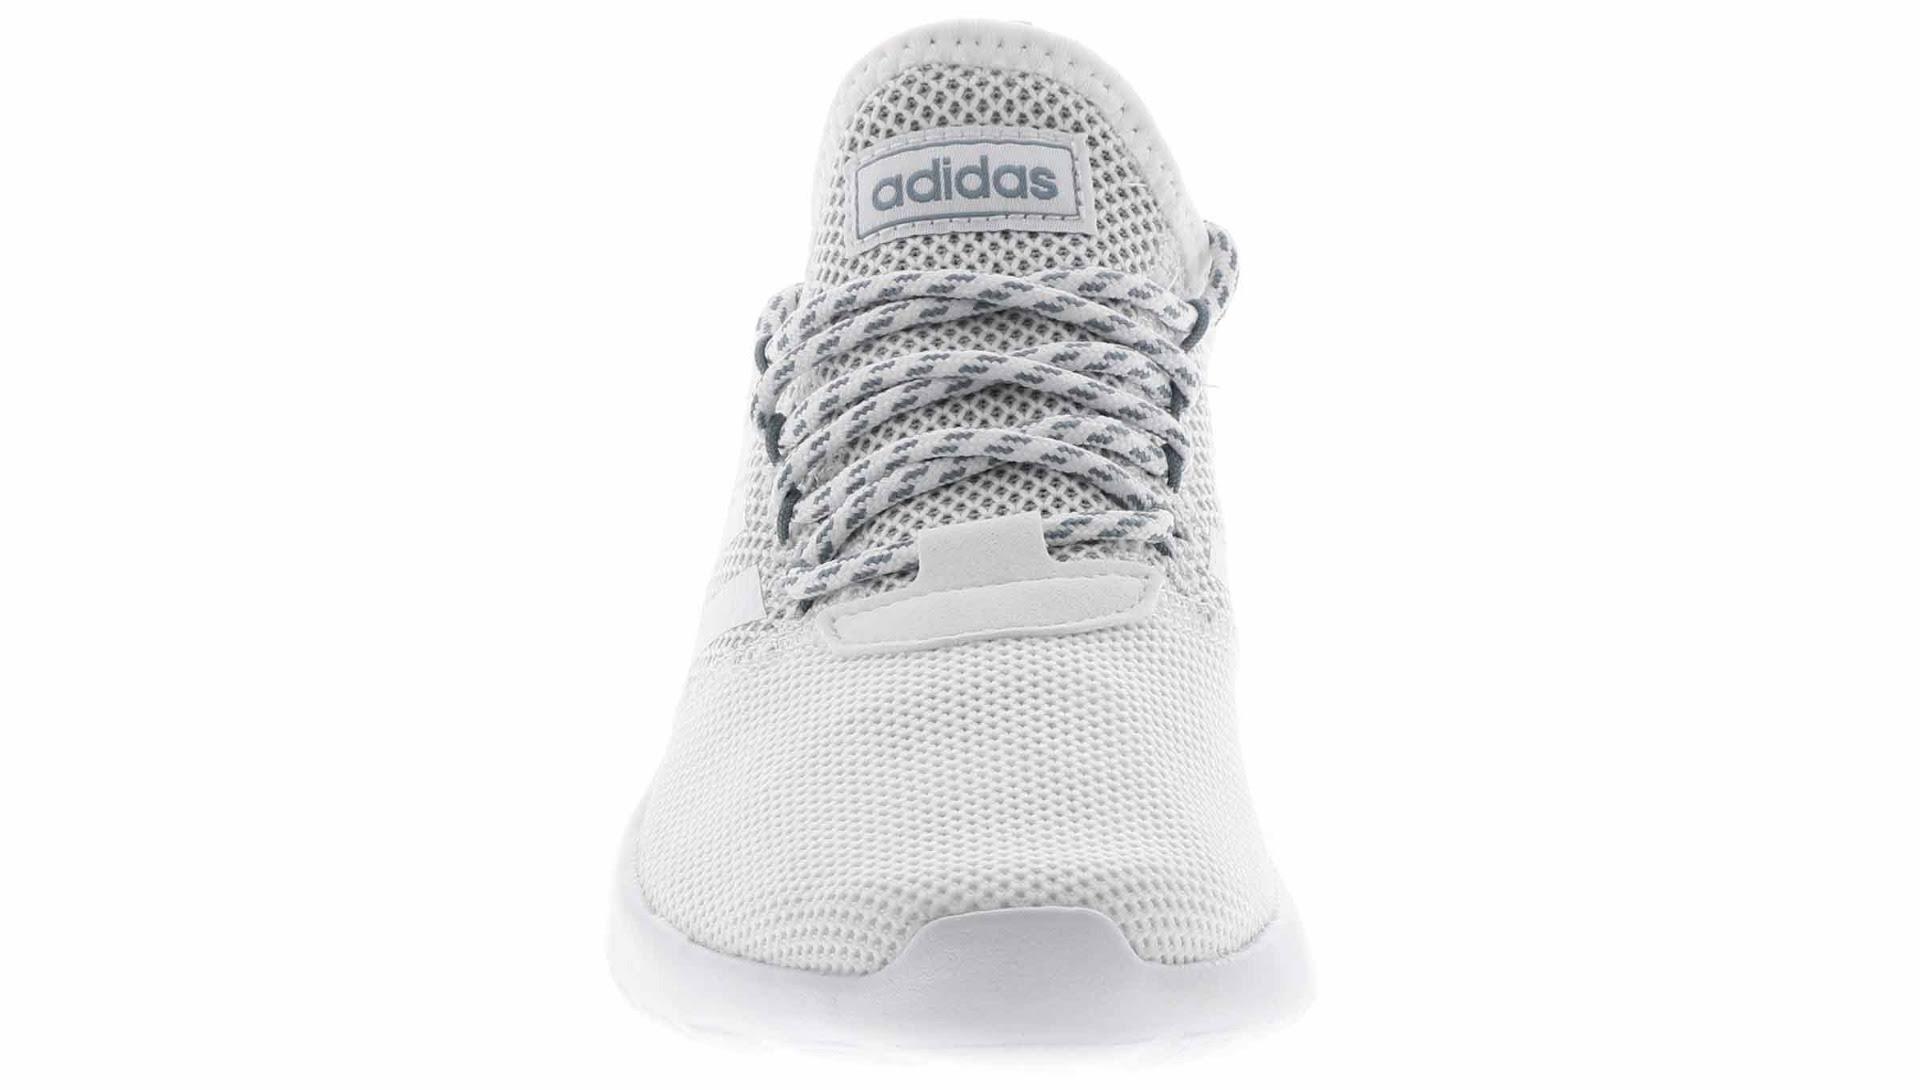 Grezzo Corsa BiancoGrigio Adidas Racer Donna Da Lite Reborn Scarpa 10 qpzMLVjUSG